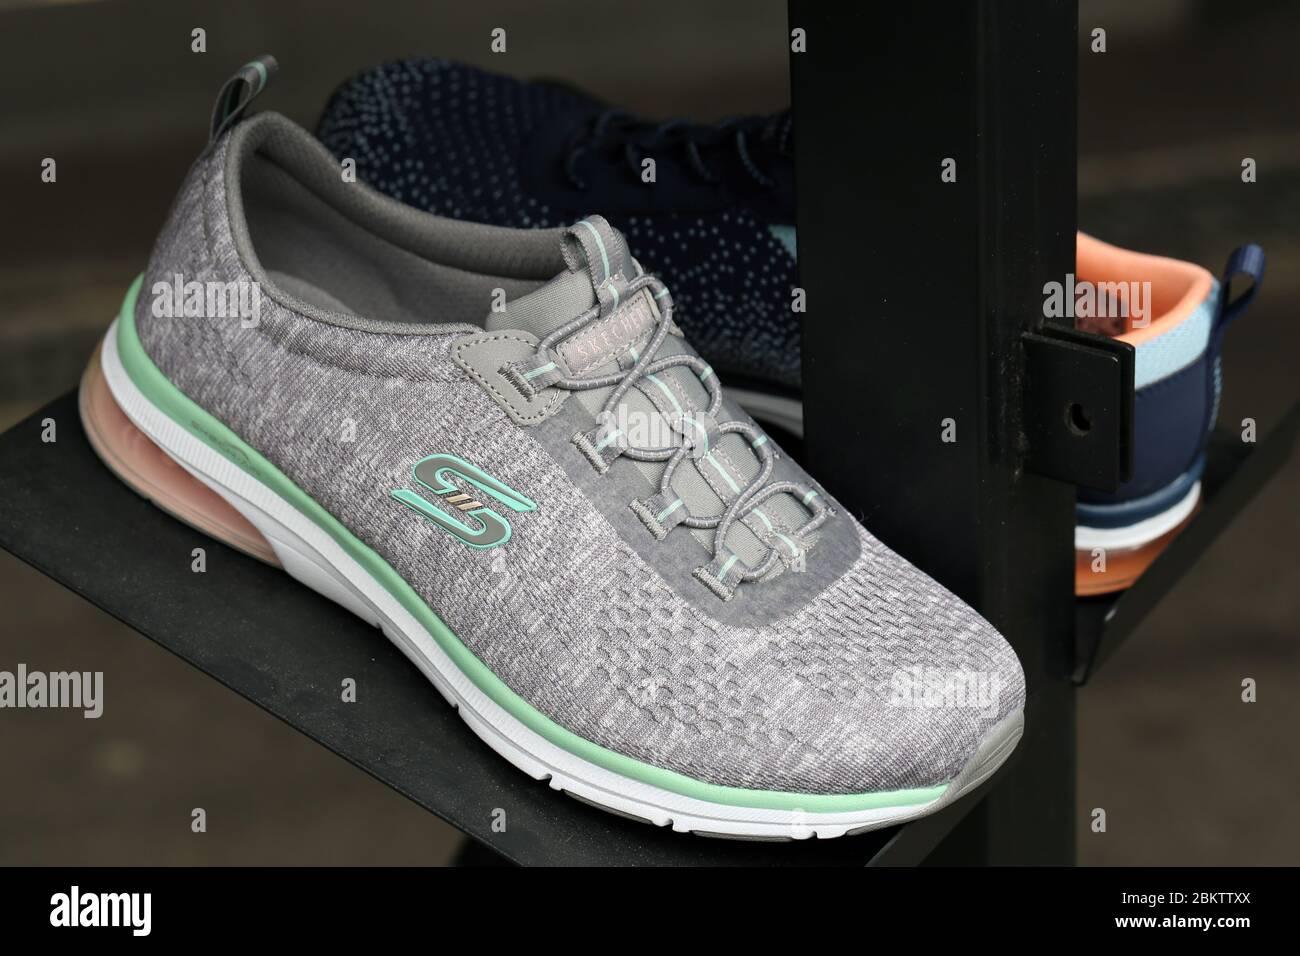 zapatos skechers 2014